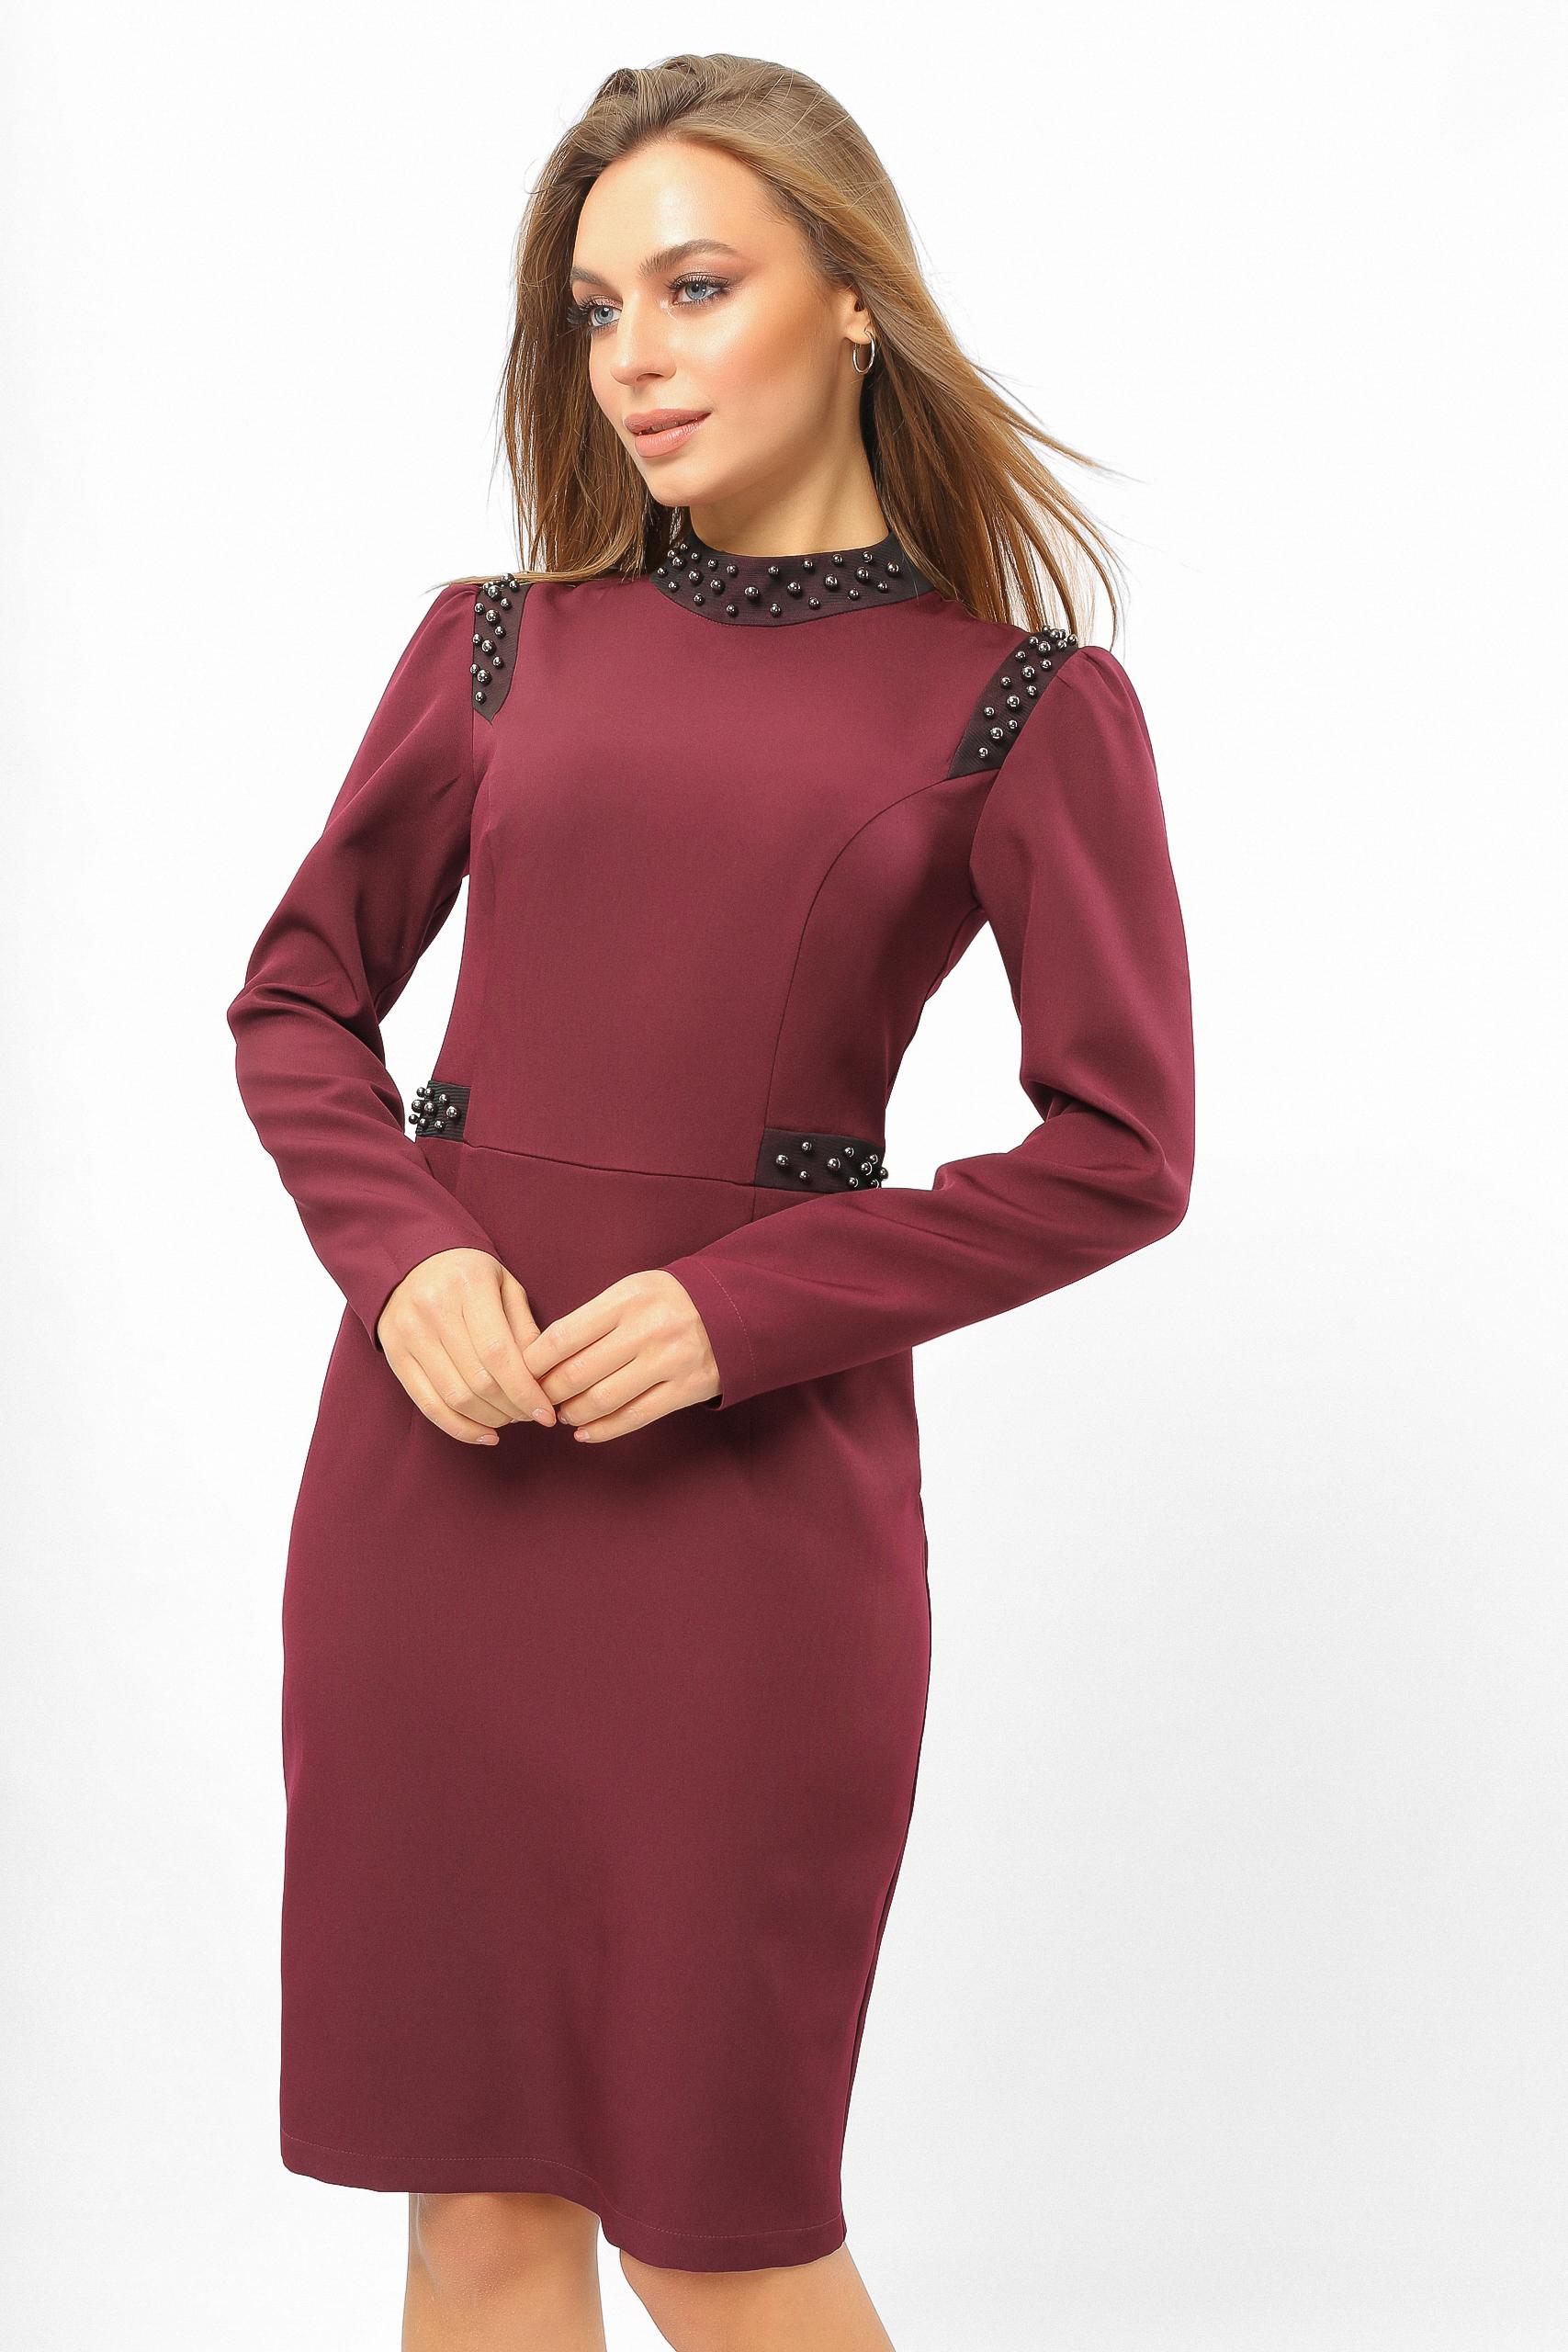 Сукня з намистинами Марсала Lipar